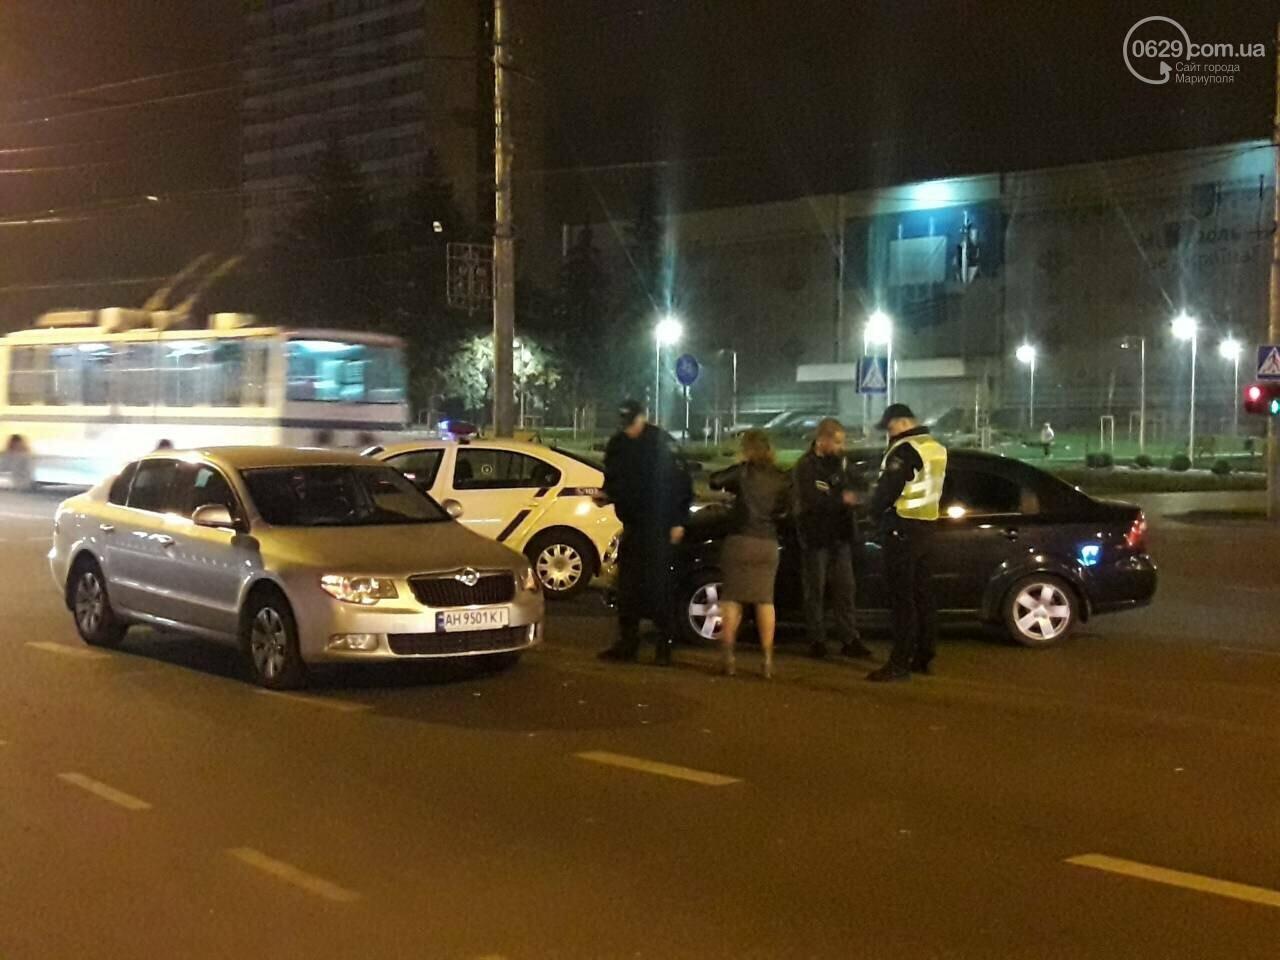 В центре Мариуполя столкнулись два автомобиля, — ФОТО, фото-1